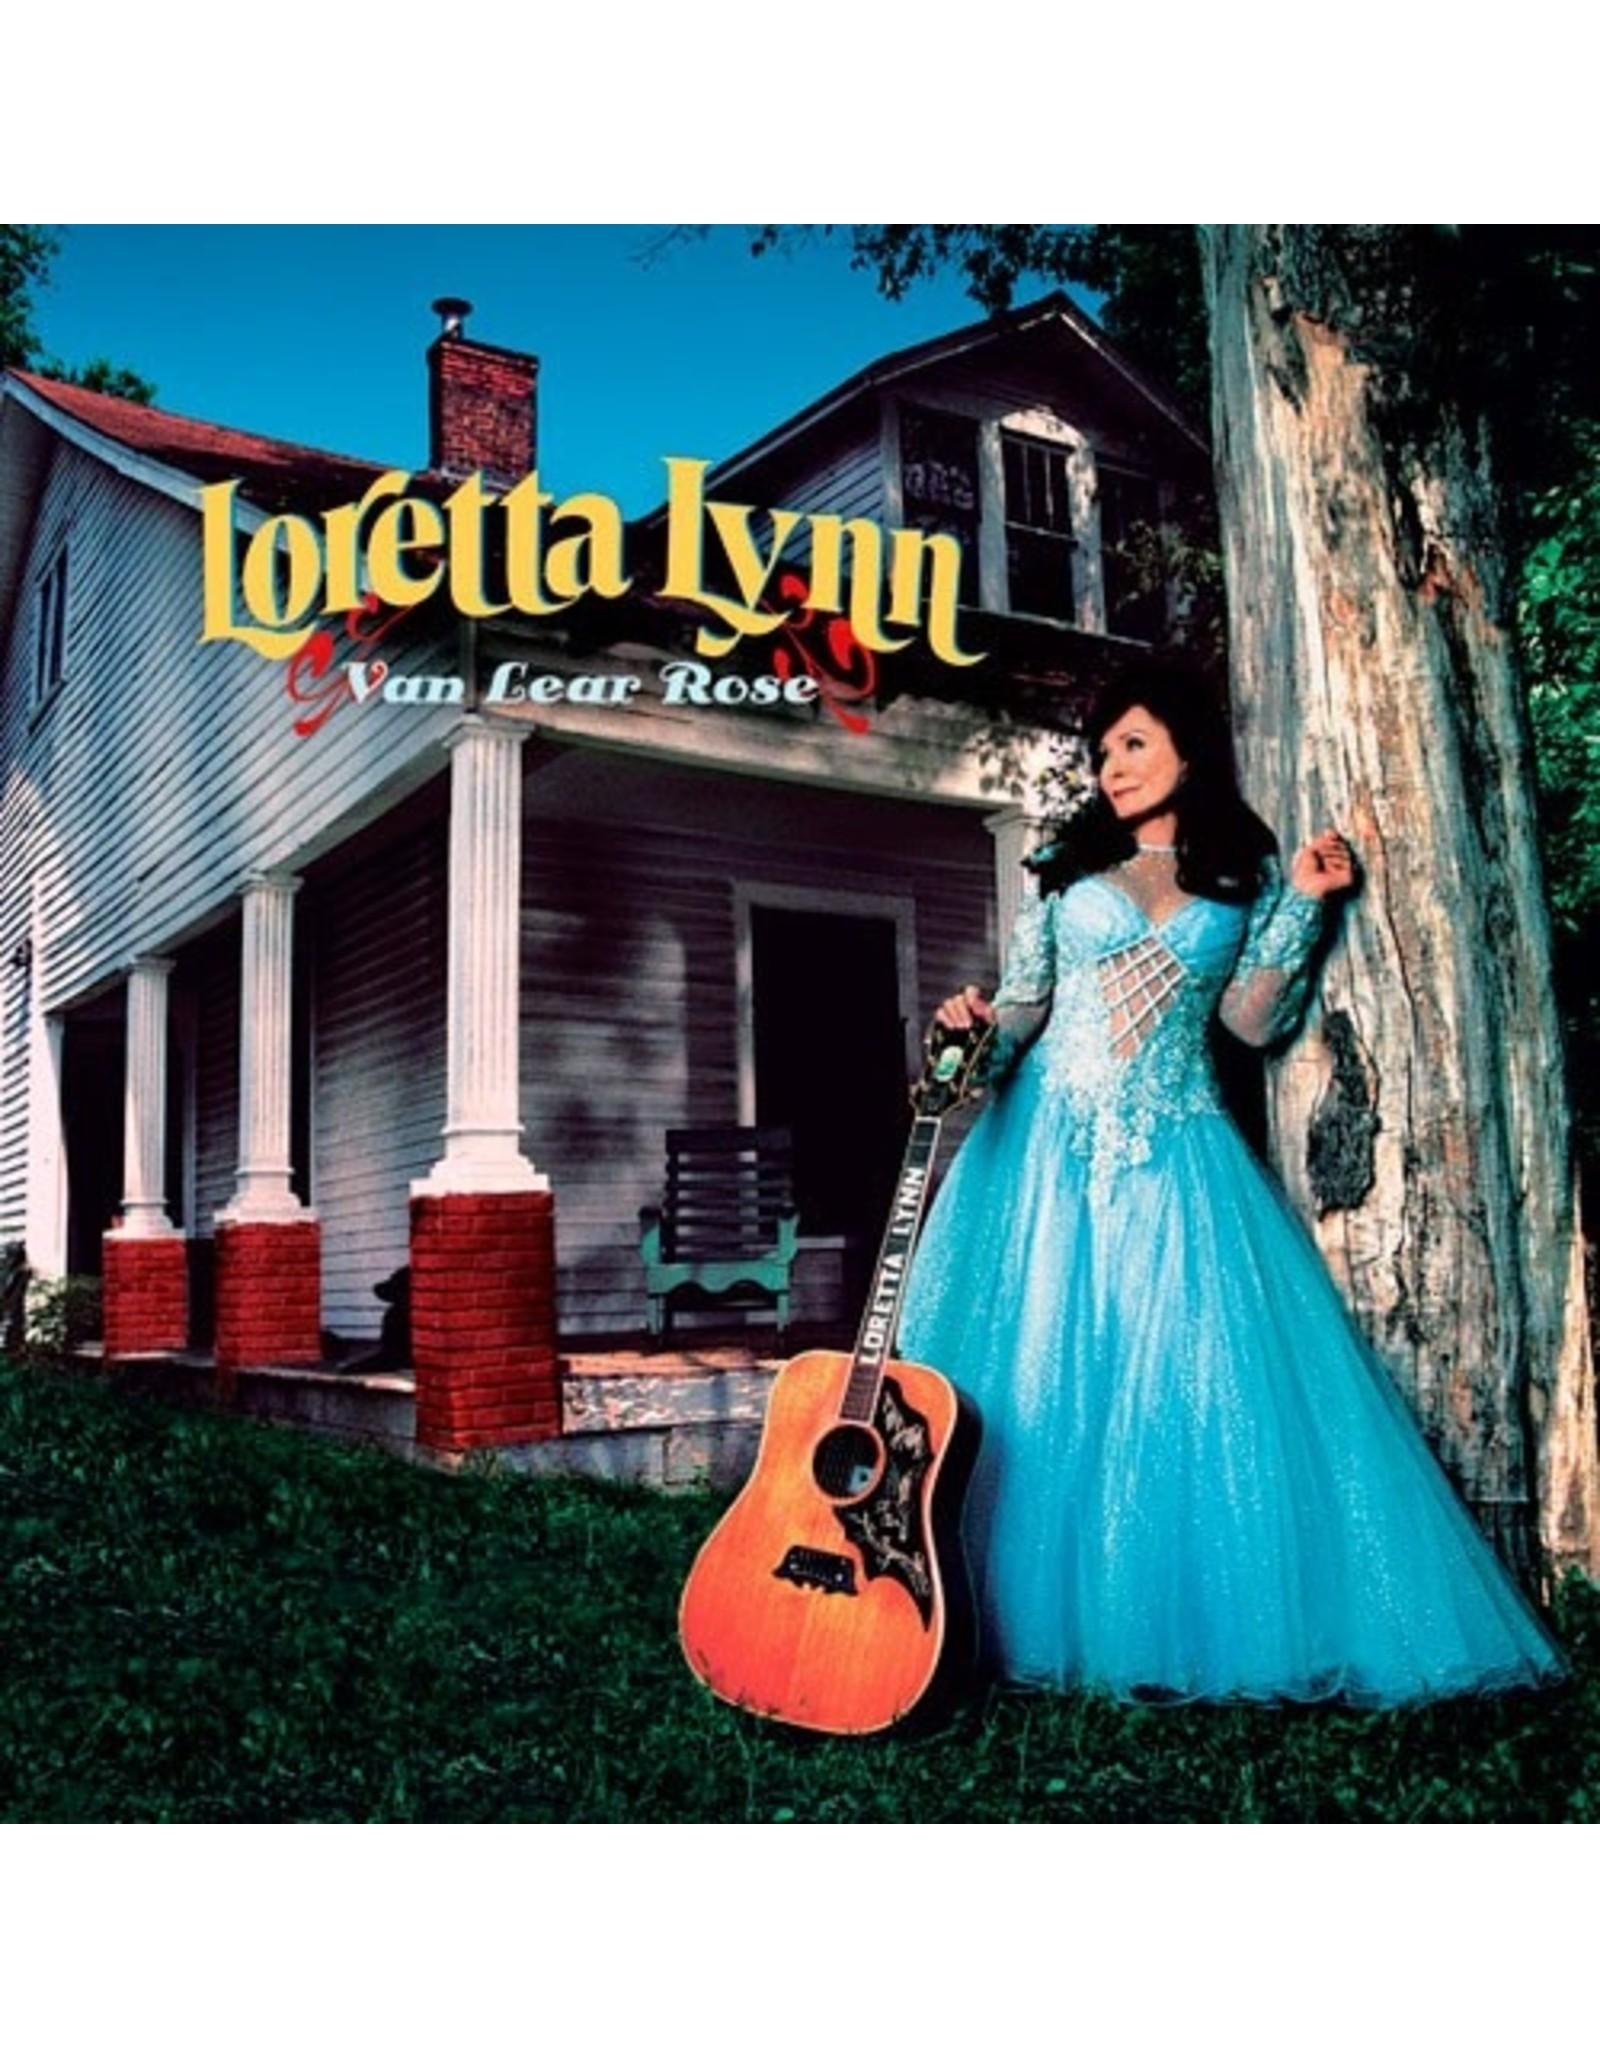 New Vinyl Loretta Lynn - Van Lear Rose LP